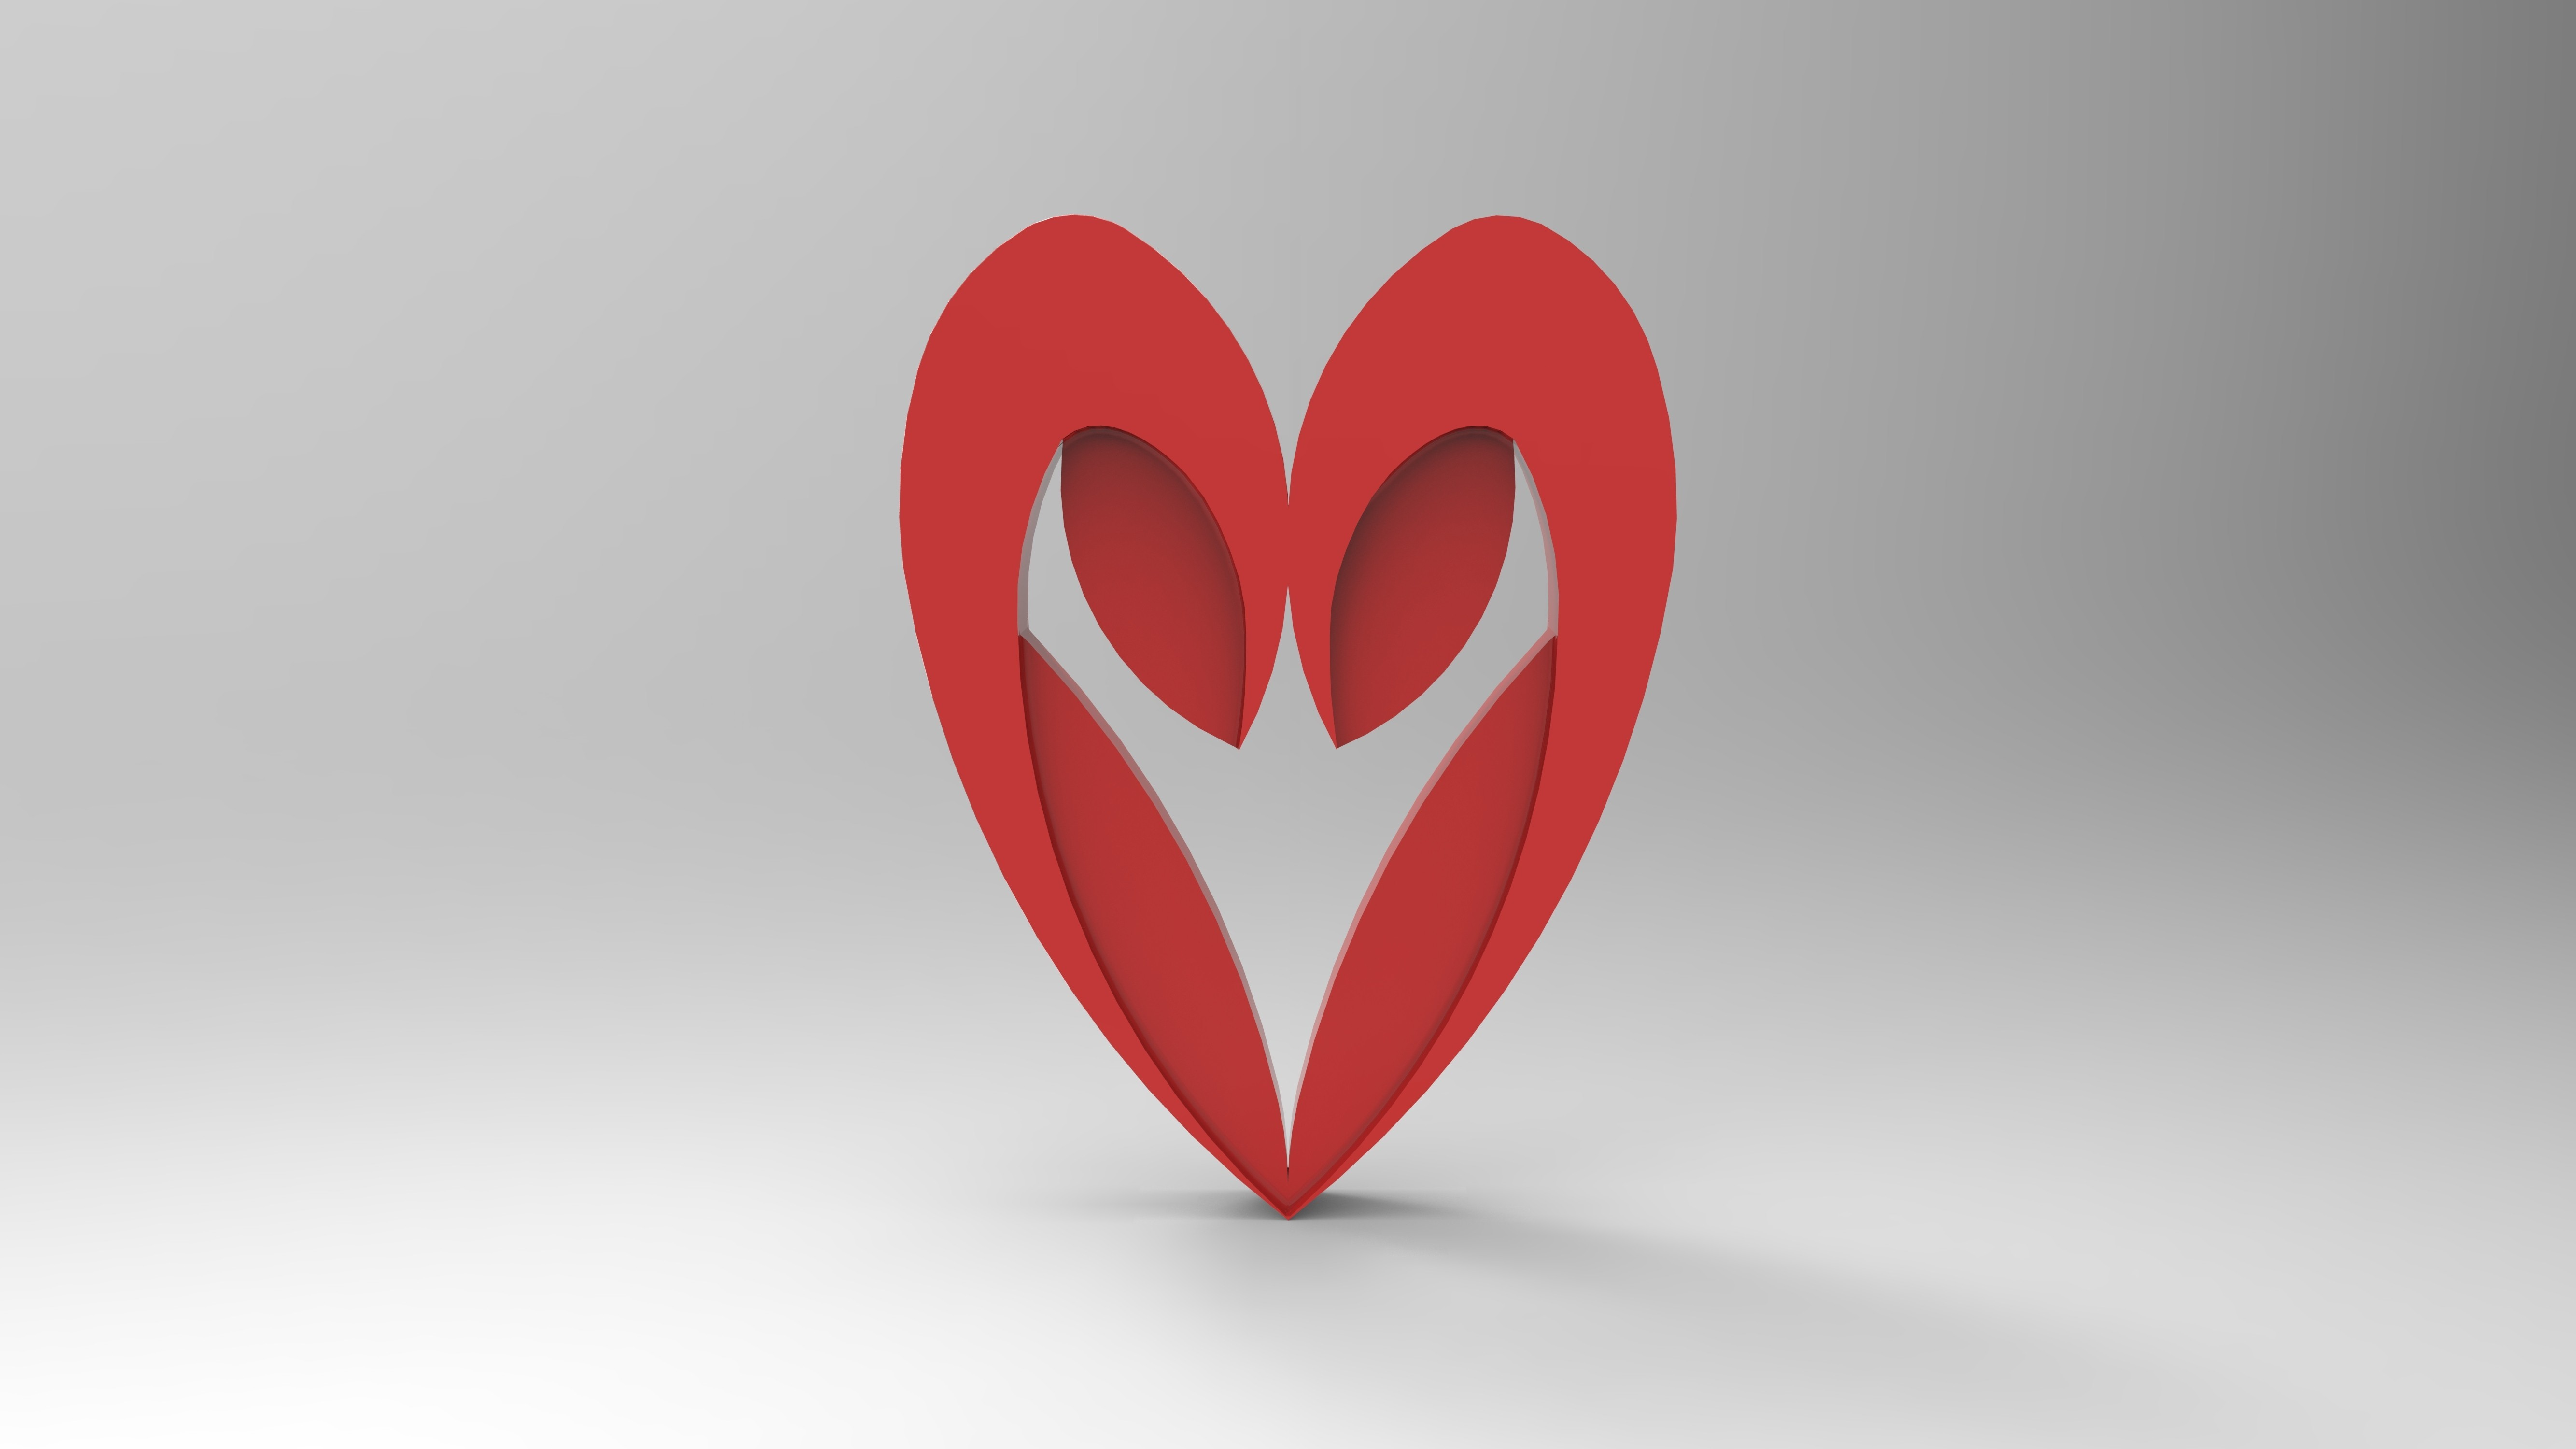 rendu simple rouge face.158.jpg Download free STL file Heart from the stratomaker logo • 3D print object, GuilhemPerroud